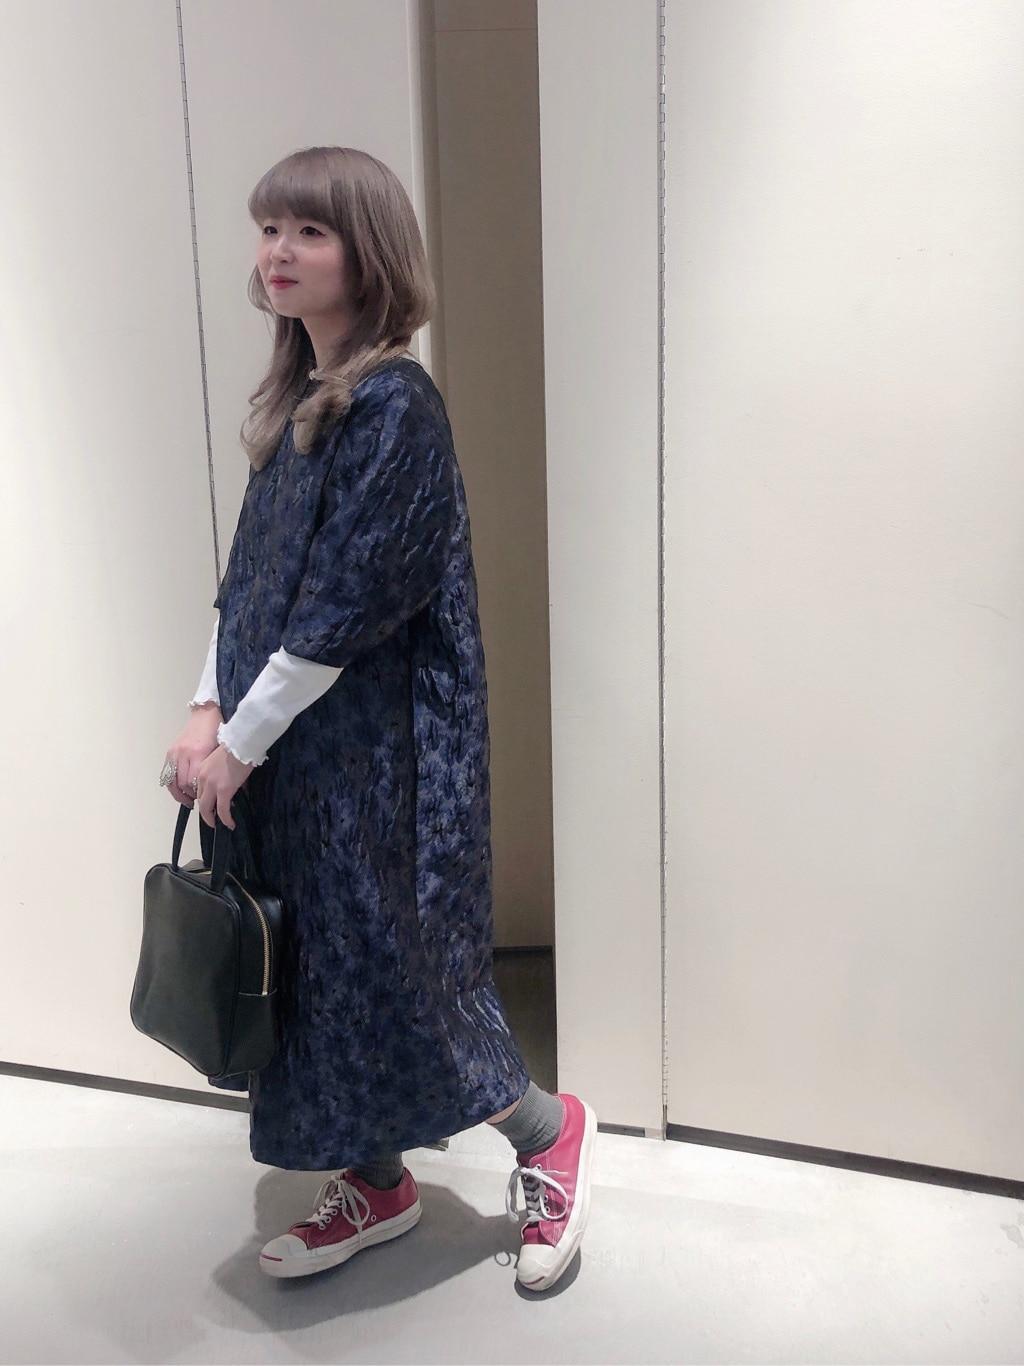 bulle de savon 阪急西宮ガーデンズ 身長:152cm 2020.03.25